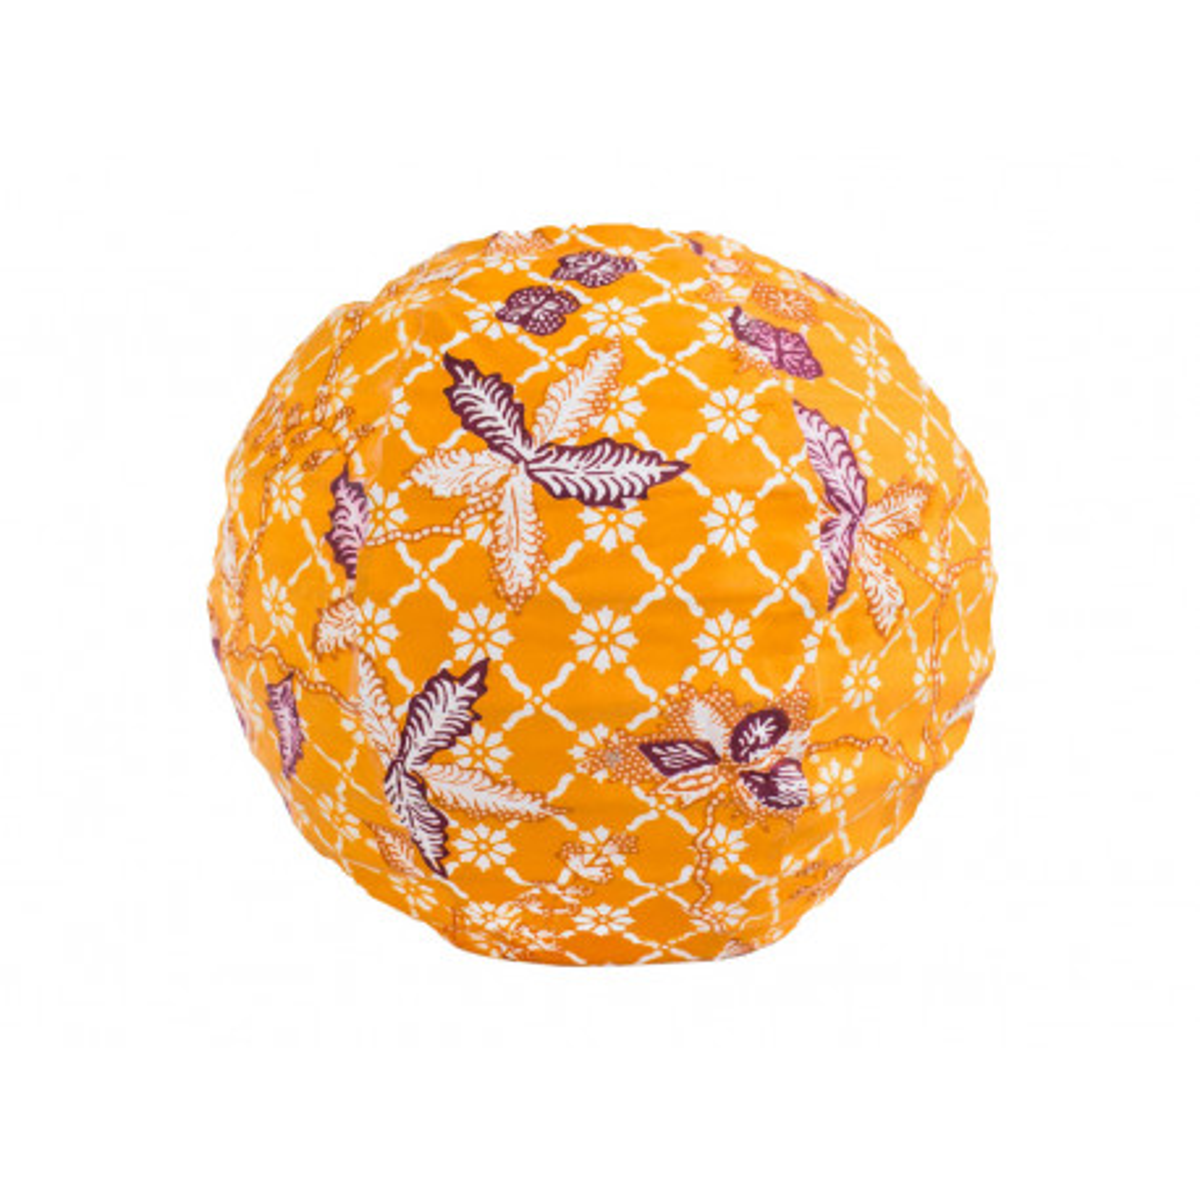 Lampion tissu boule japonaise mini rond jaune tournesol